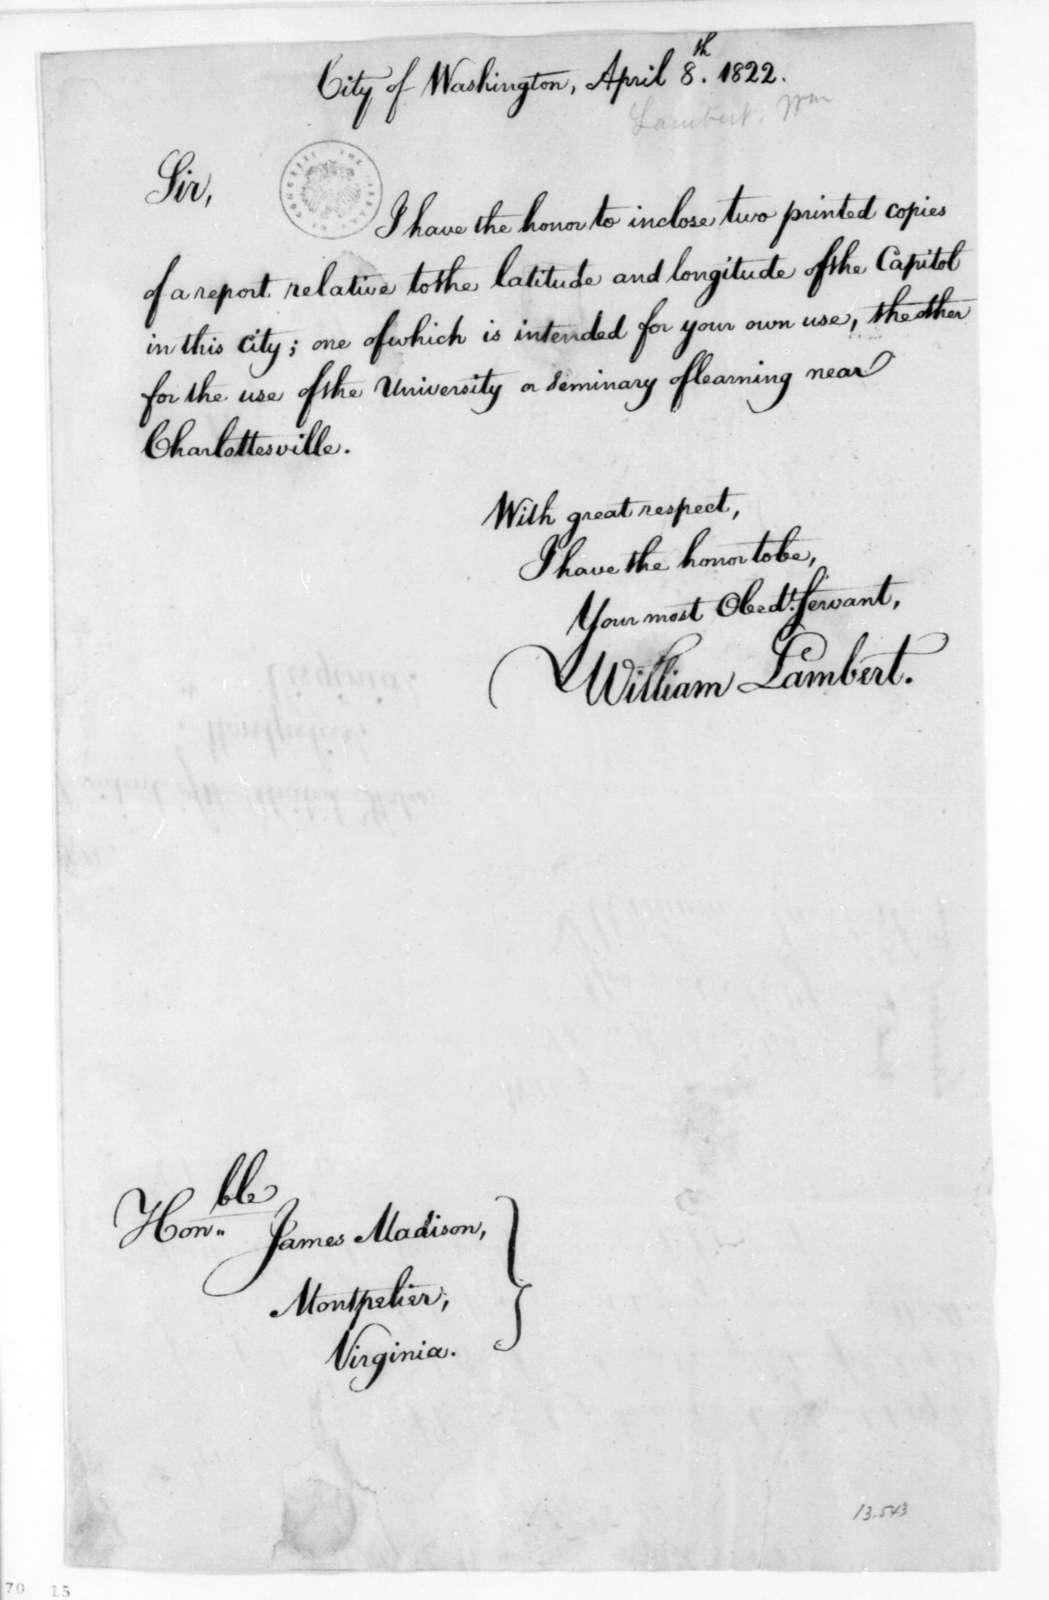 William Lambert to James Madison, April 8, 1822.